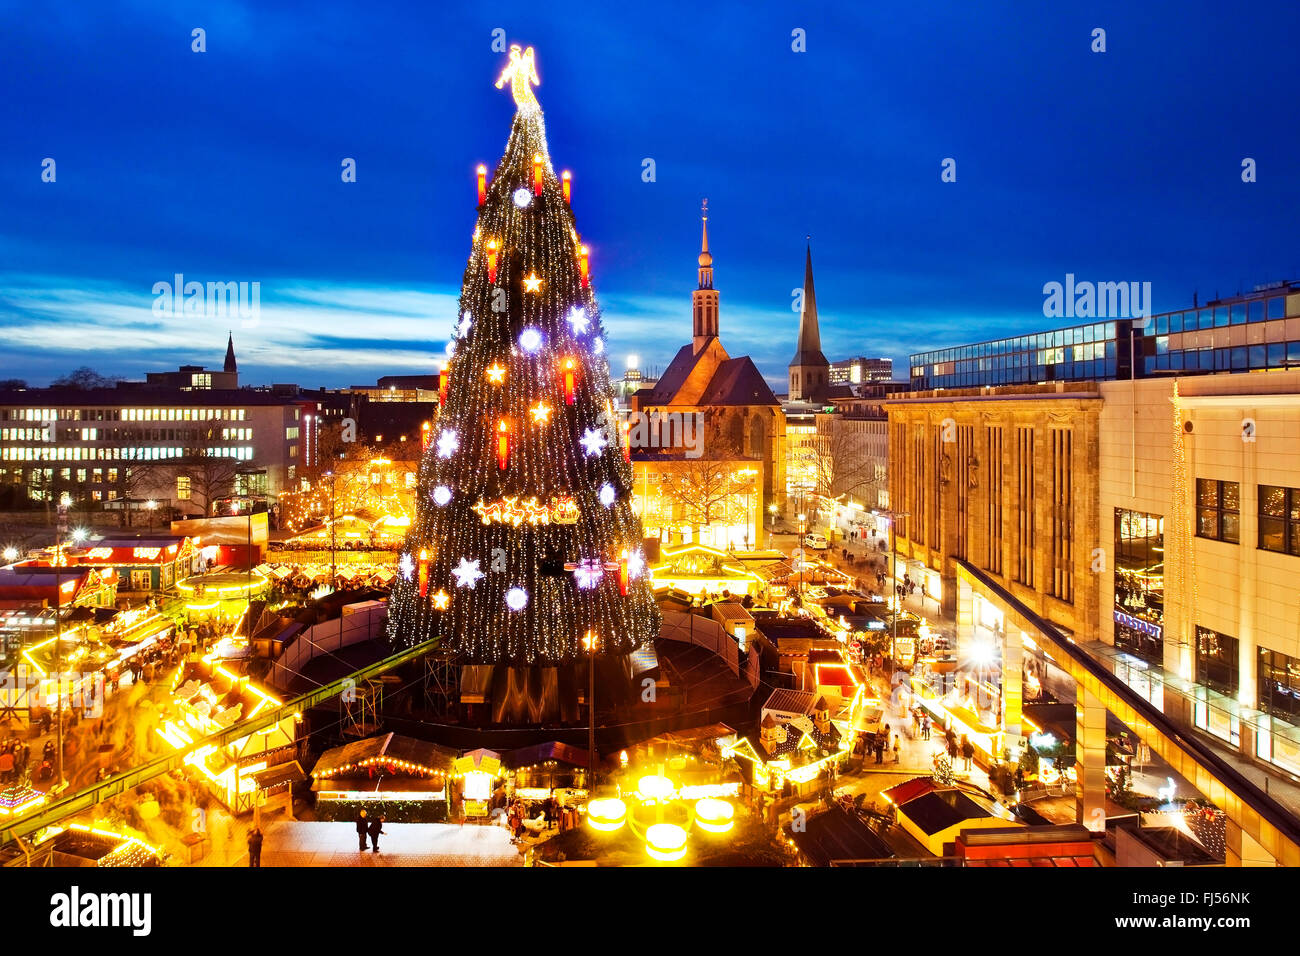 Christmas market with gigantic Christmas tree on Hansaplatz, Germany, North Rhine-Westphalia, Ruhr Area, Dortmund - Stock Image